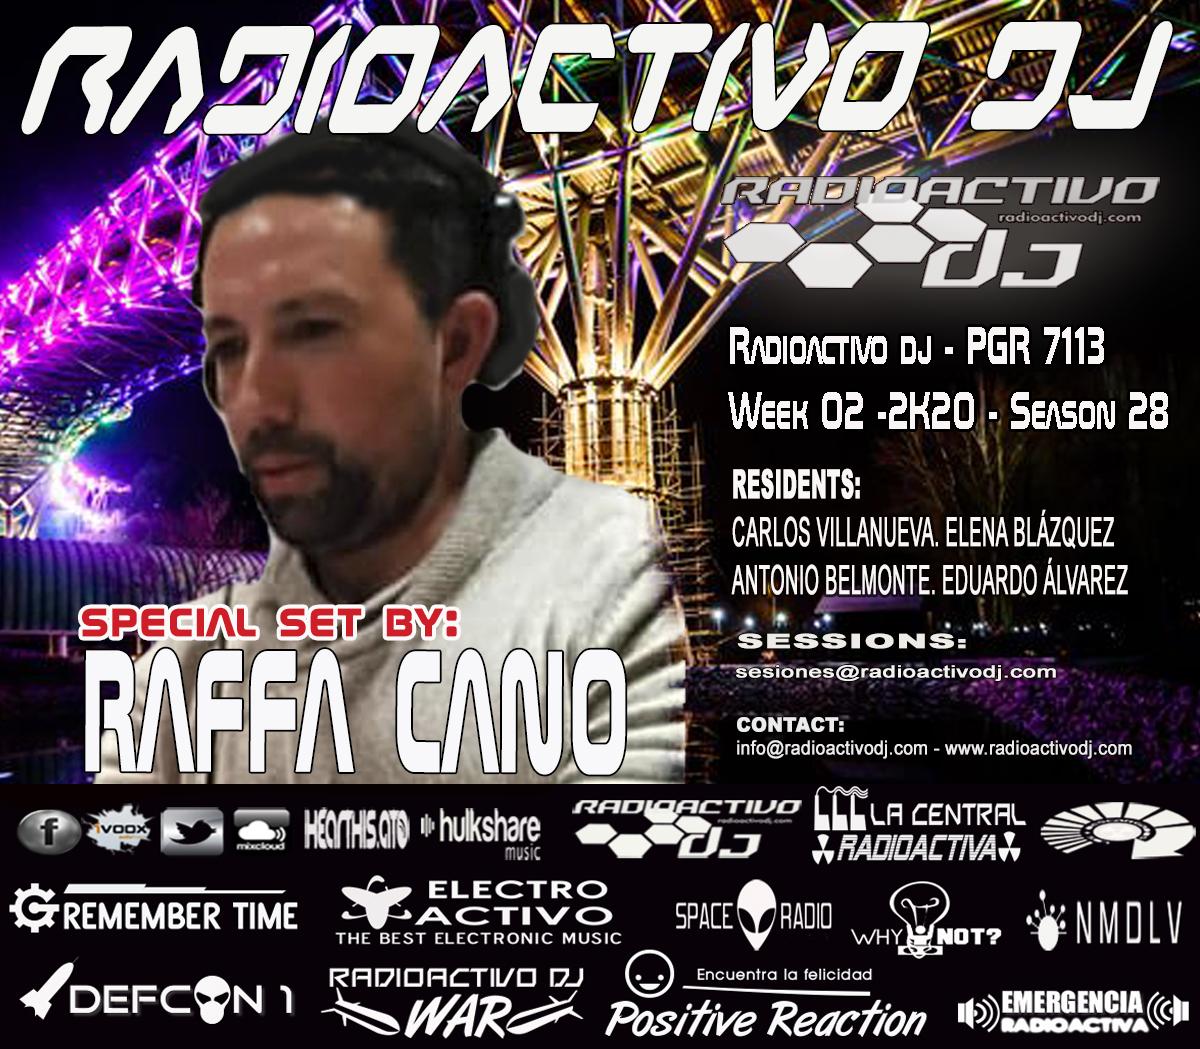 RADIOACTIVO-DJ-02-2020